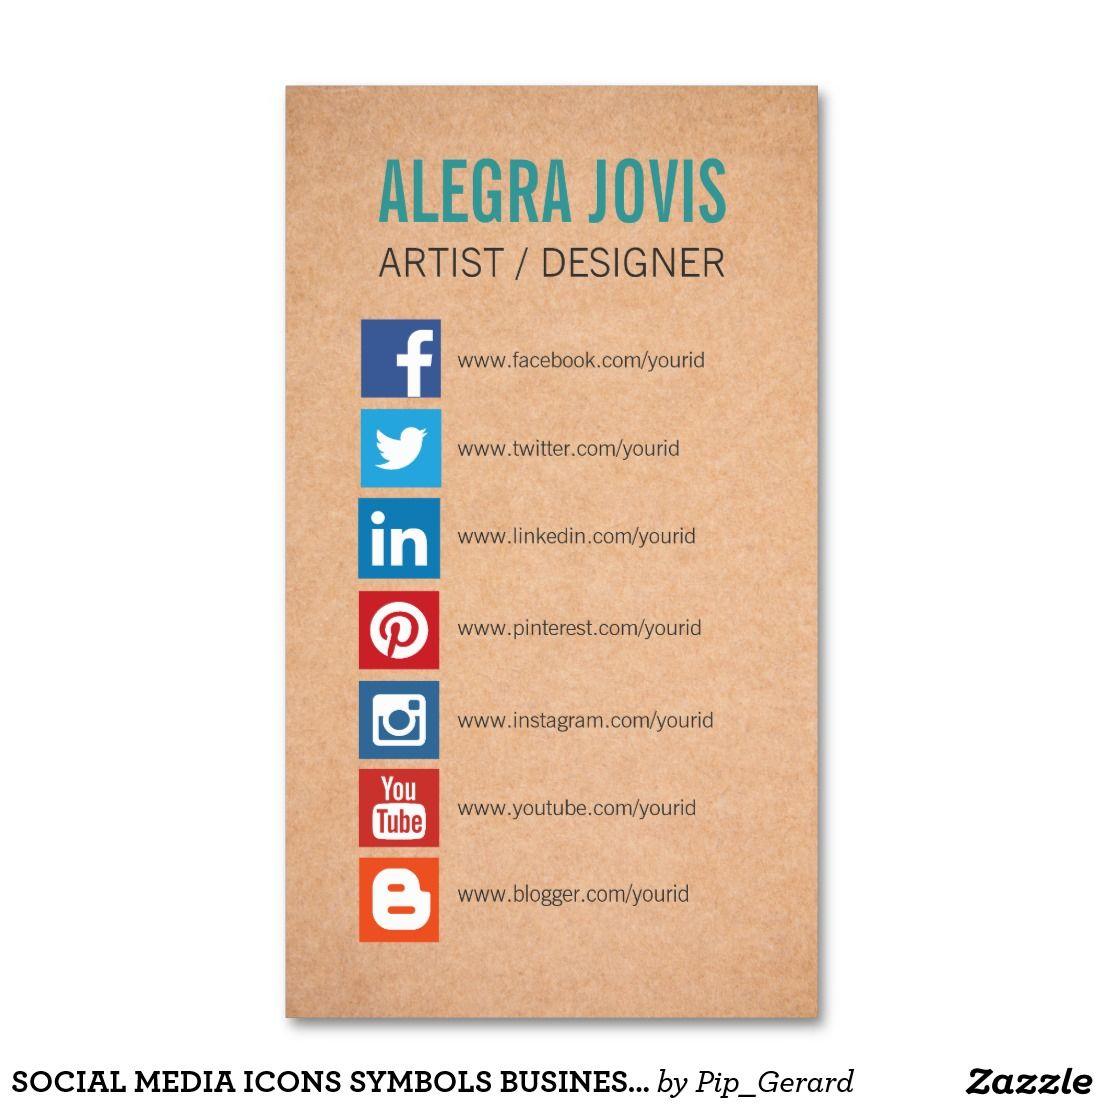 Social Media Icons Symbols Business Card Zazzle Com Social Media Business Cards Media Business Cards Social Media Business